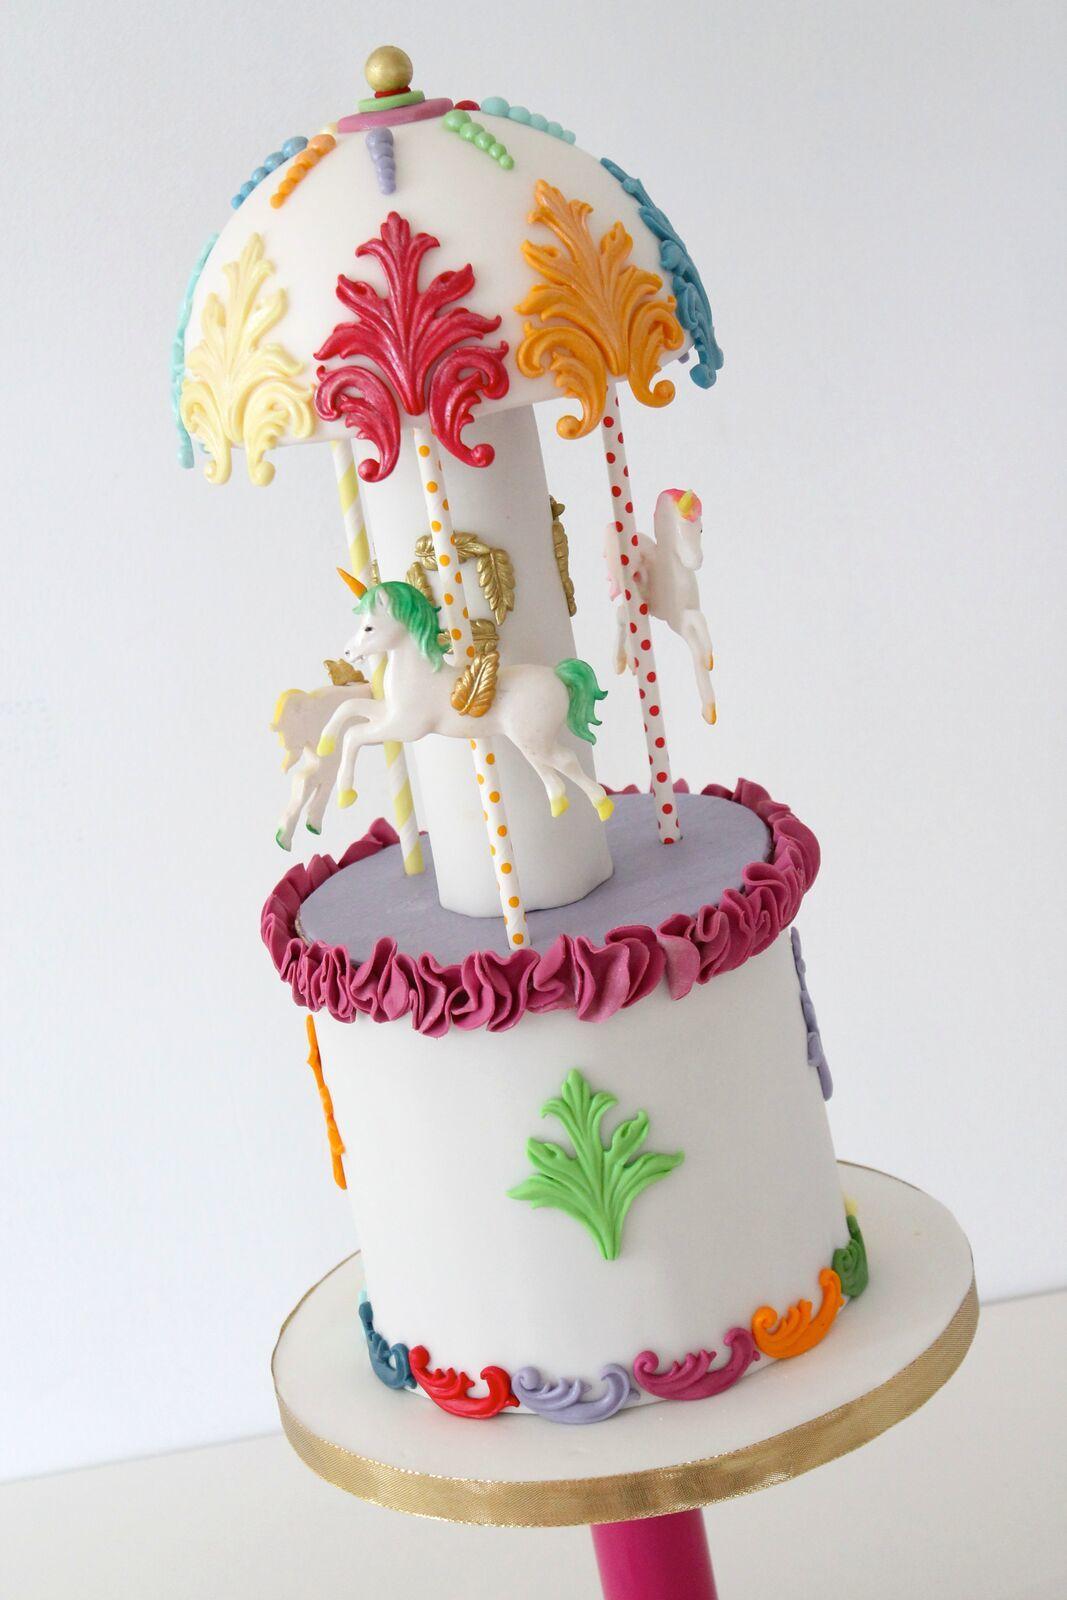 Horse carousel baby cake